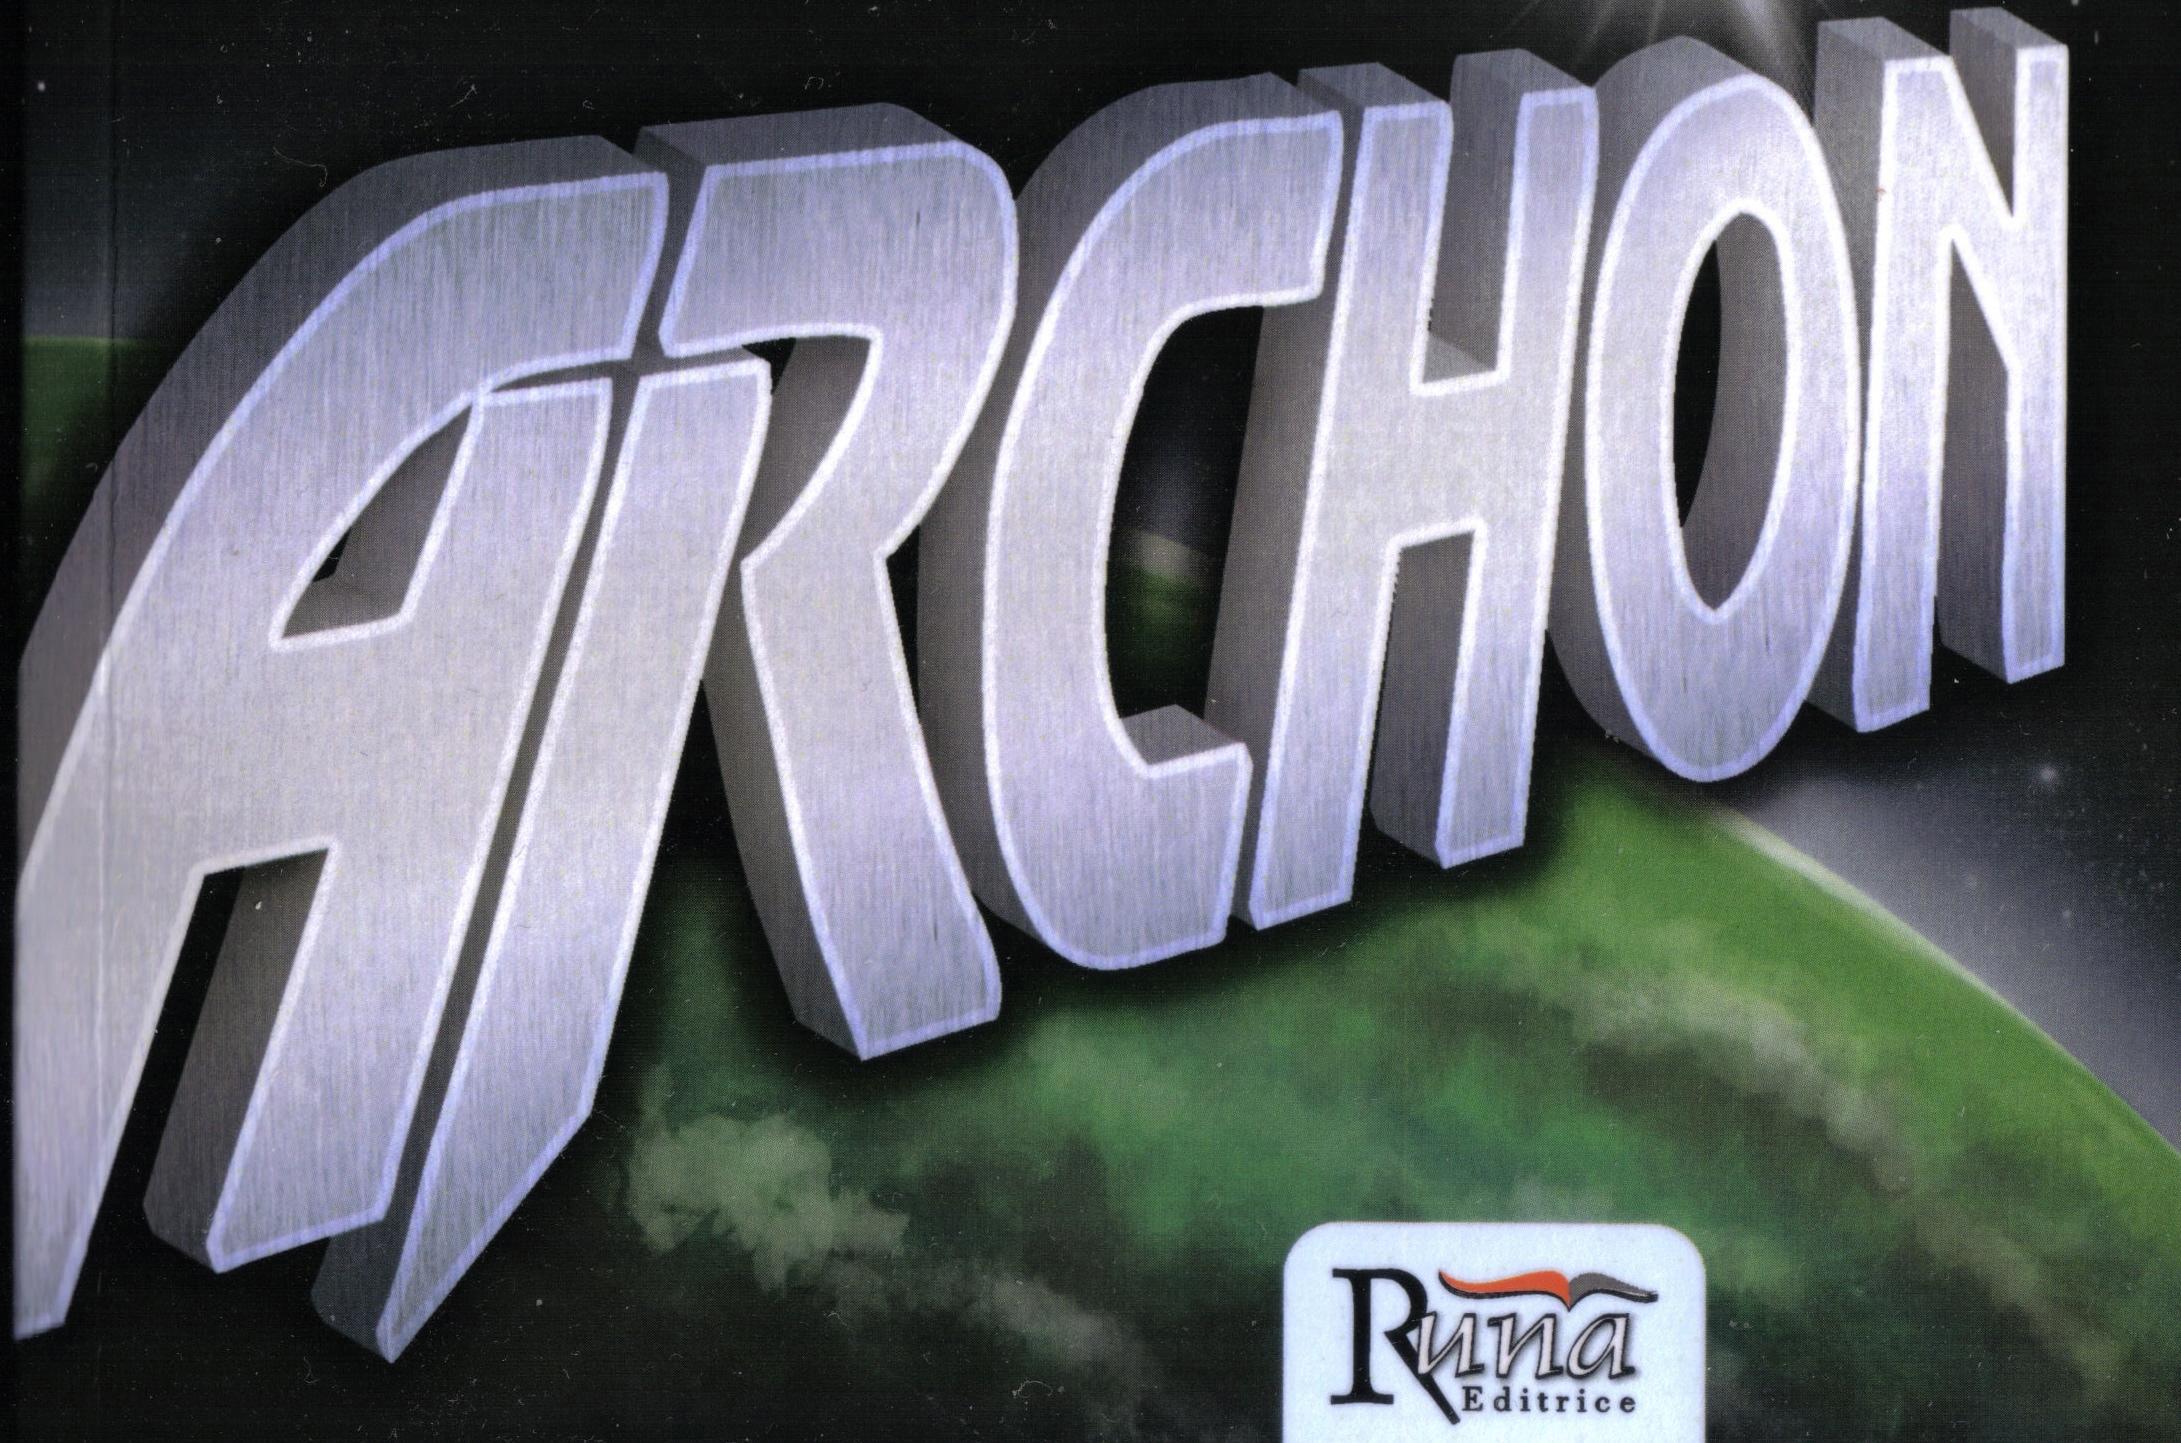 Archon - fascetta ridotta 02